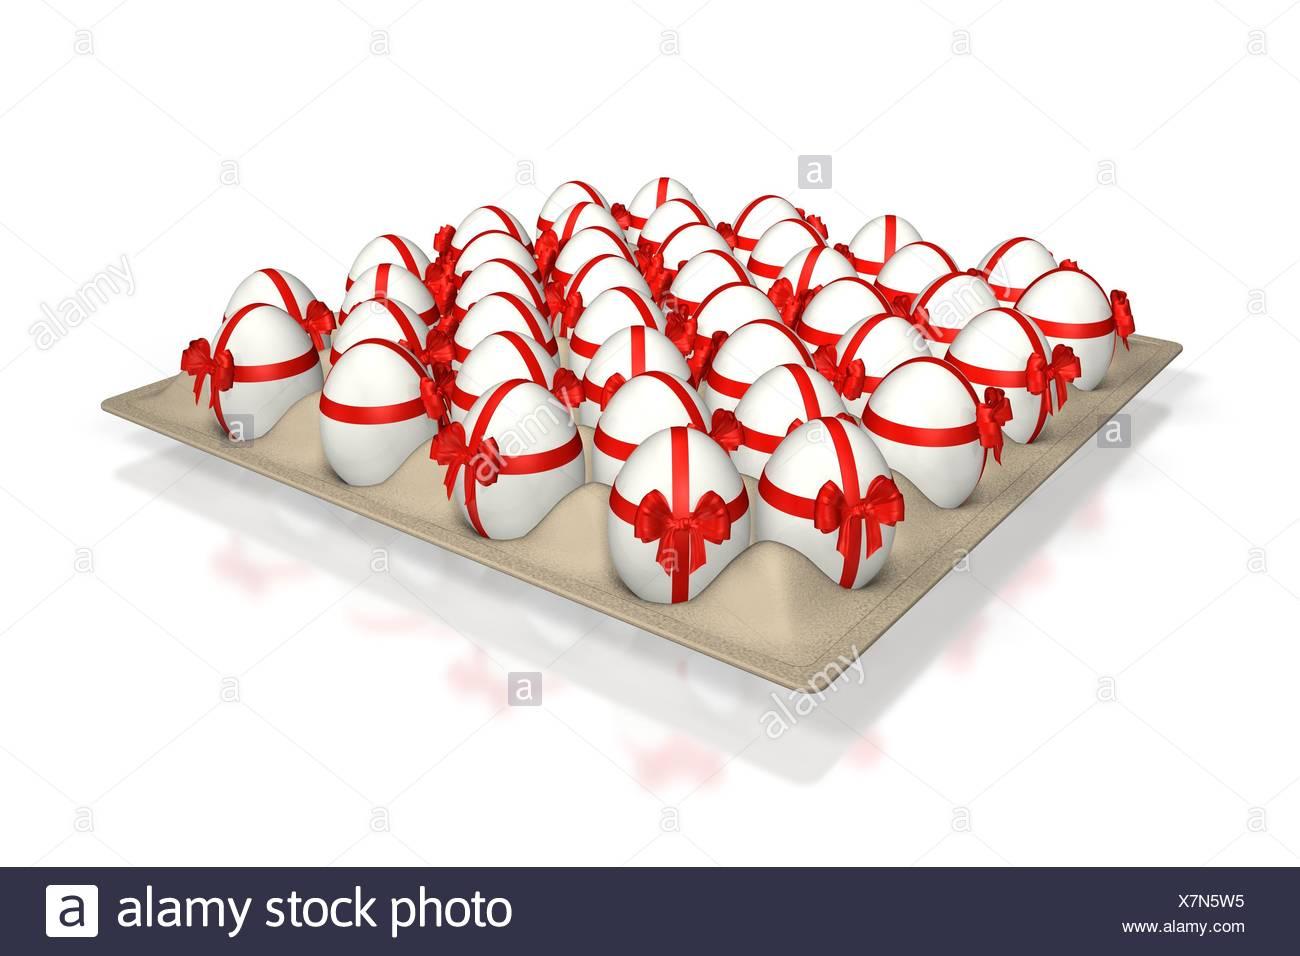 model design project concept plan draft transport loop eggs ruddiness backdrop - Stock Image